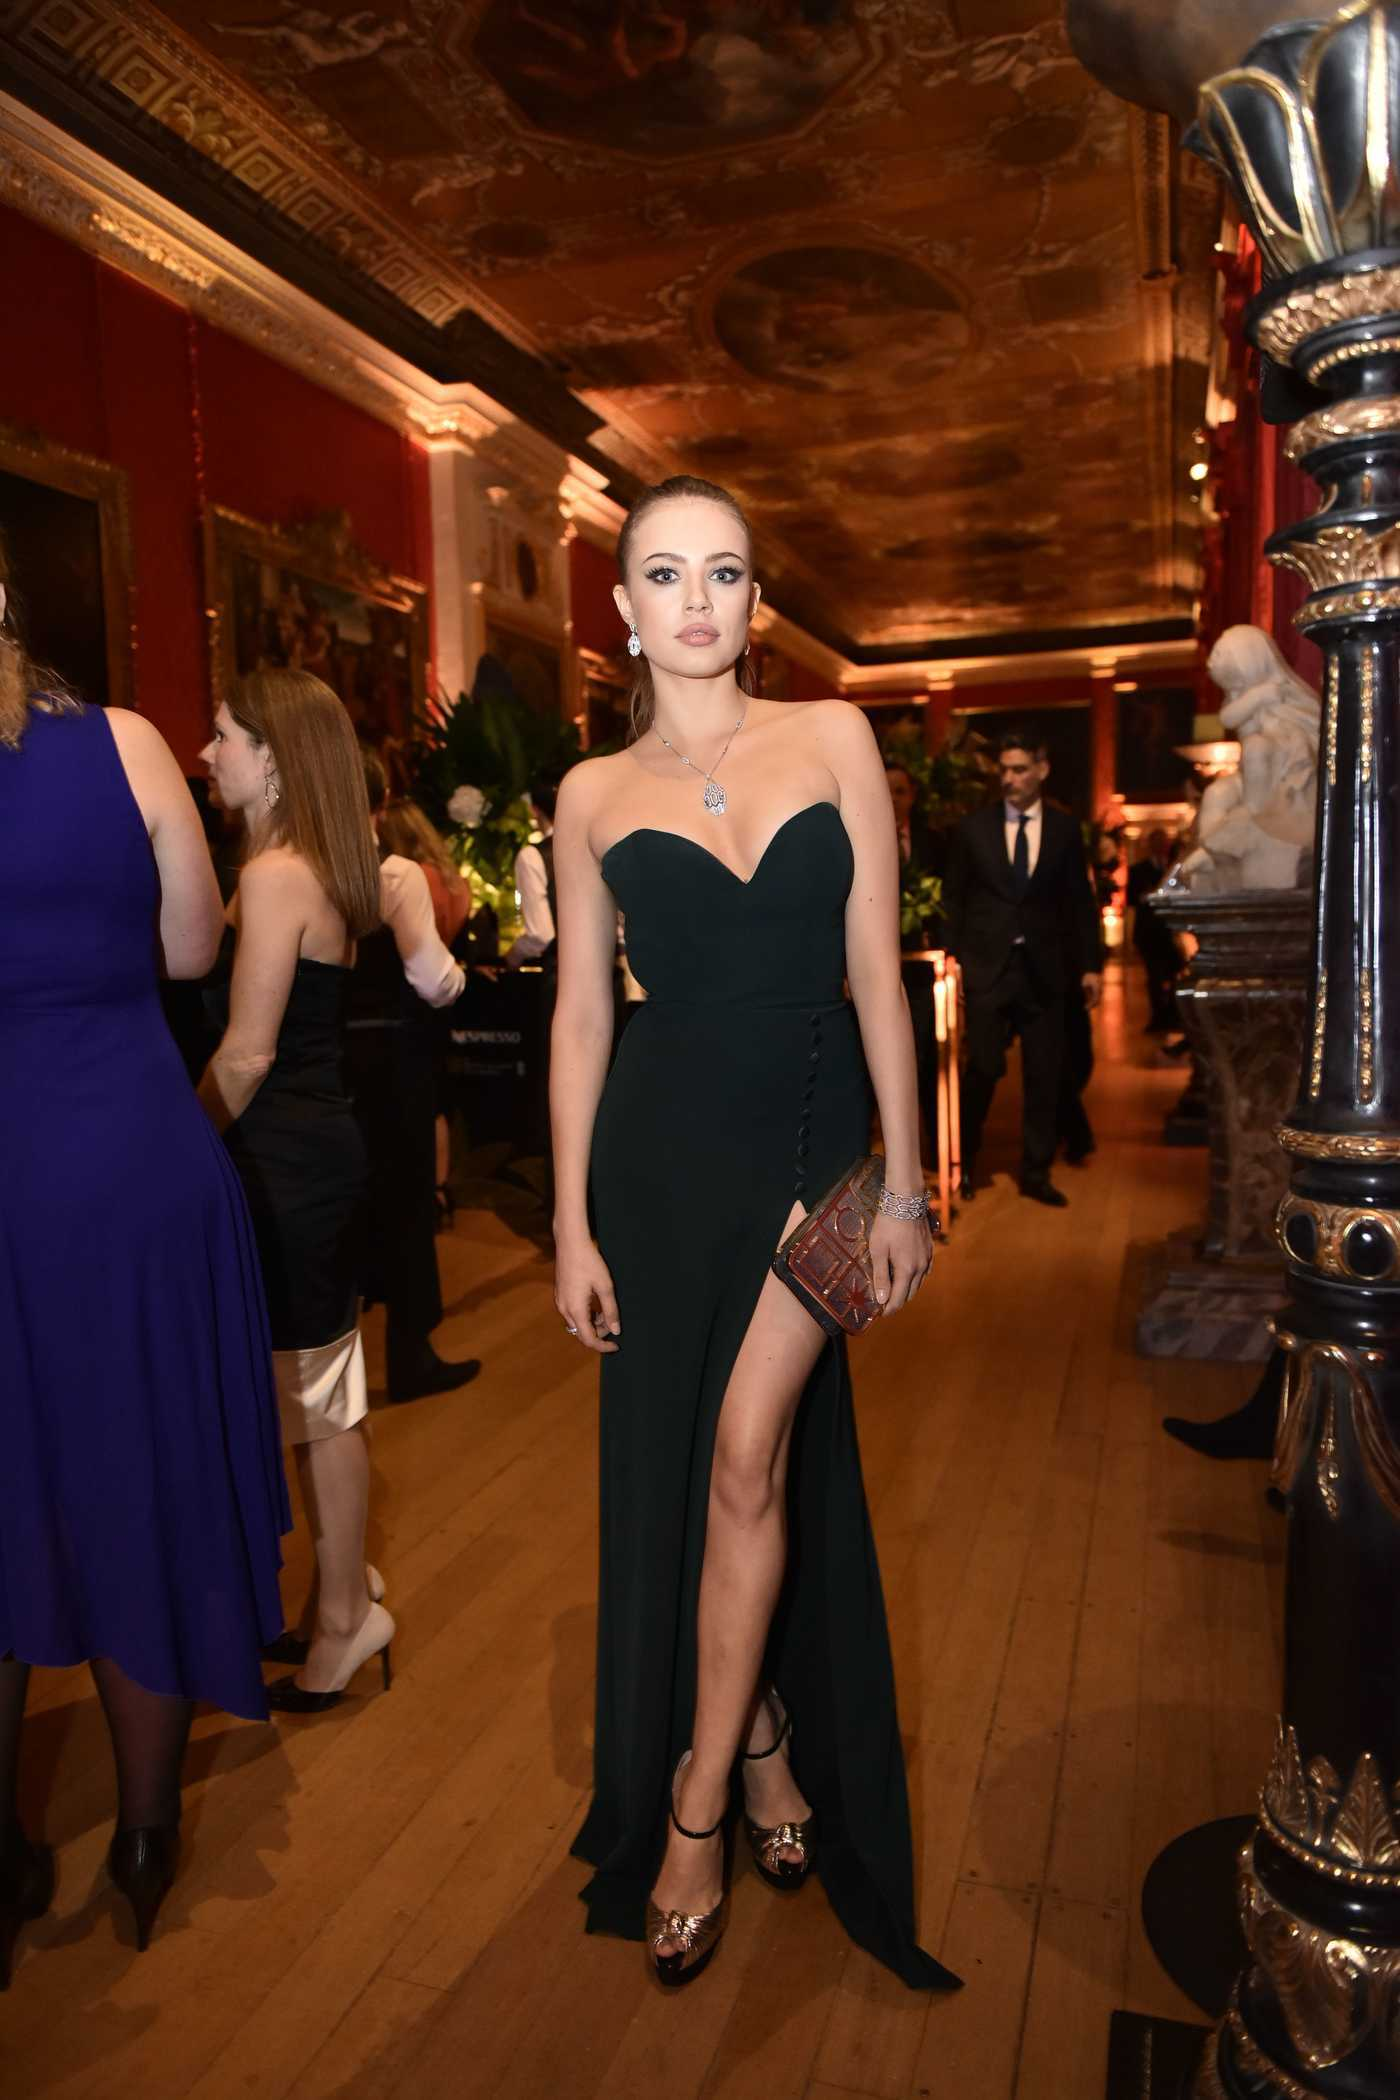 Xenia Tchoumitcheva at the BAFTA Nespresso Nominees Party in London 02/11/2017